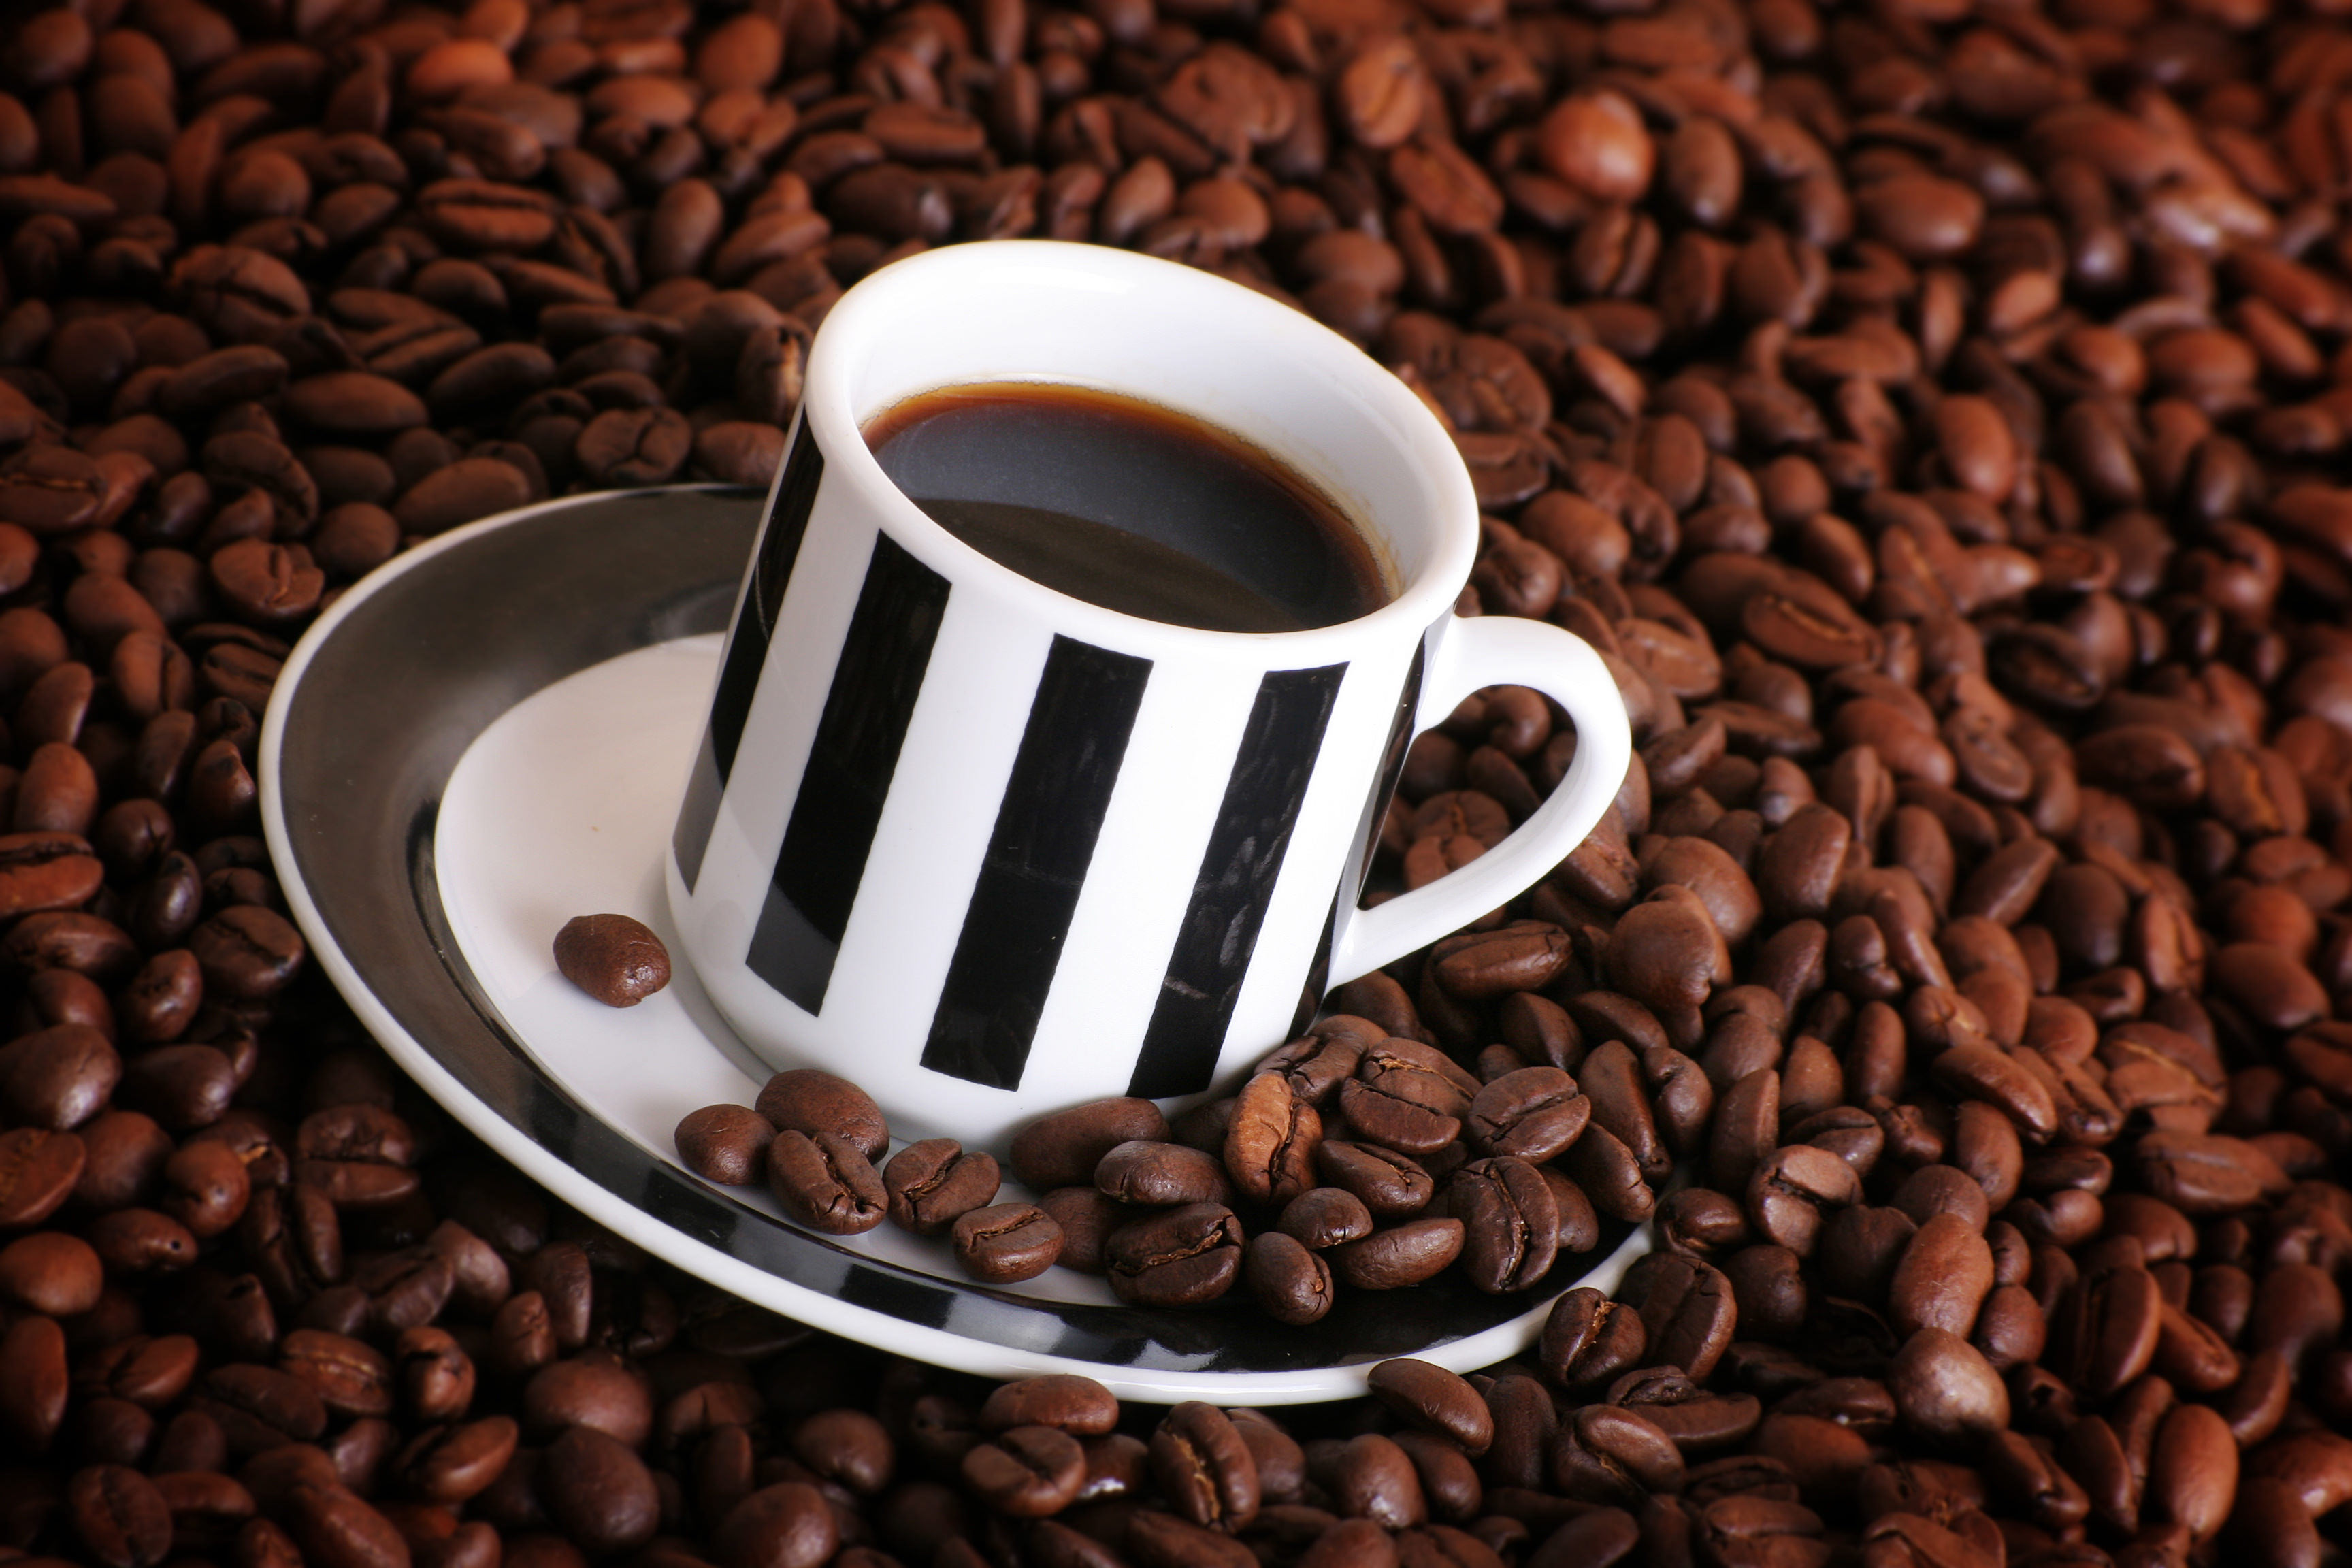 Coffee Coffee Beans Cup 3456x2304